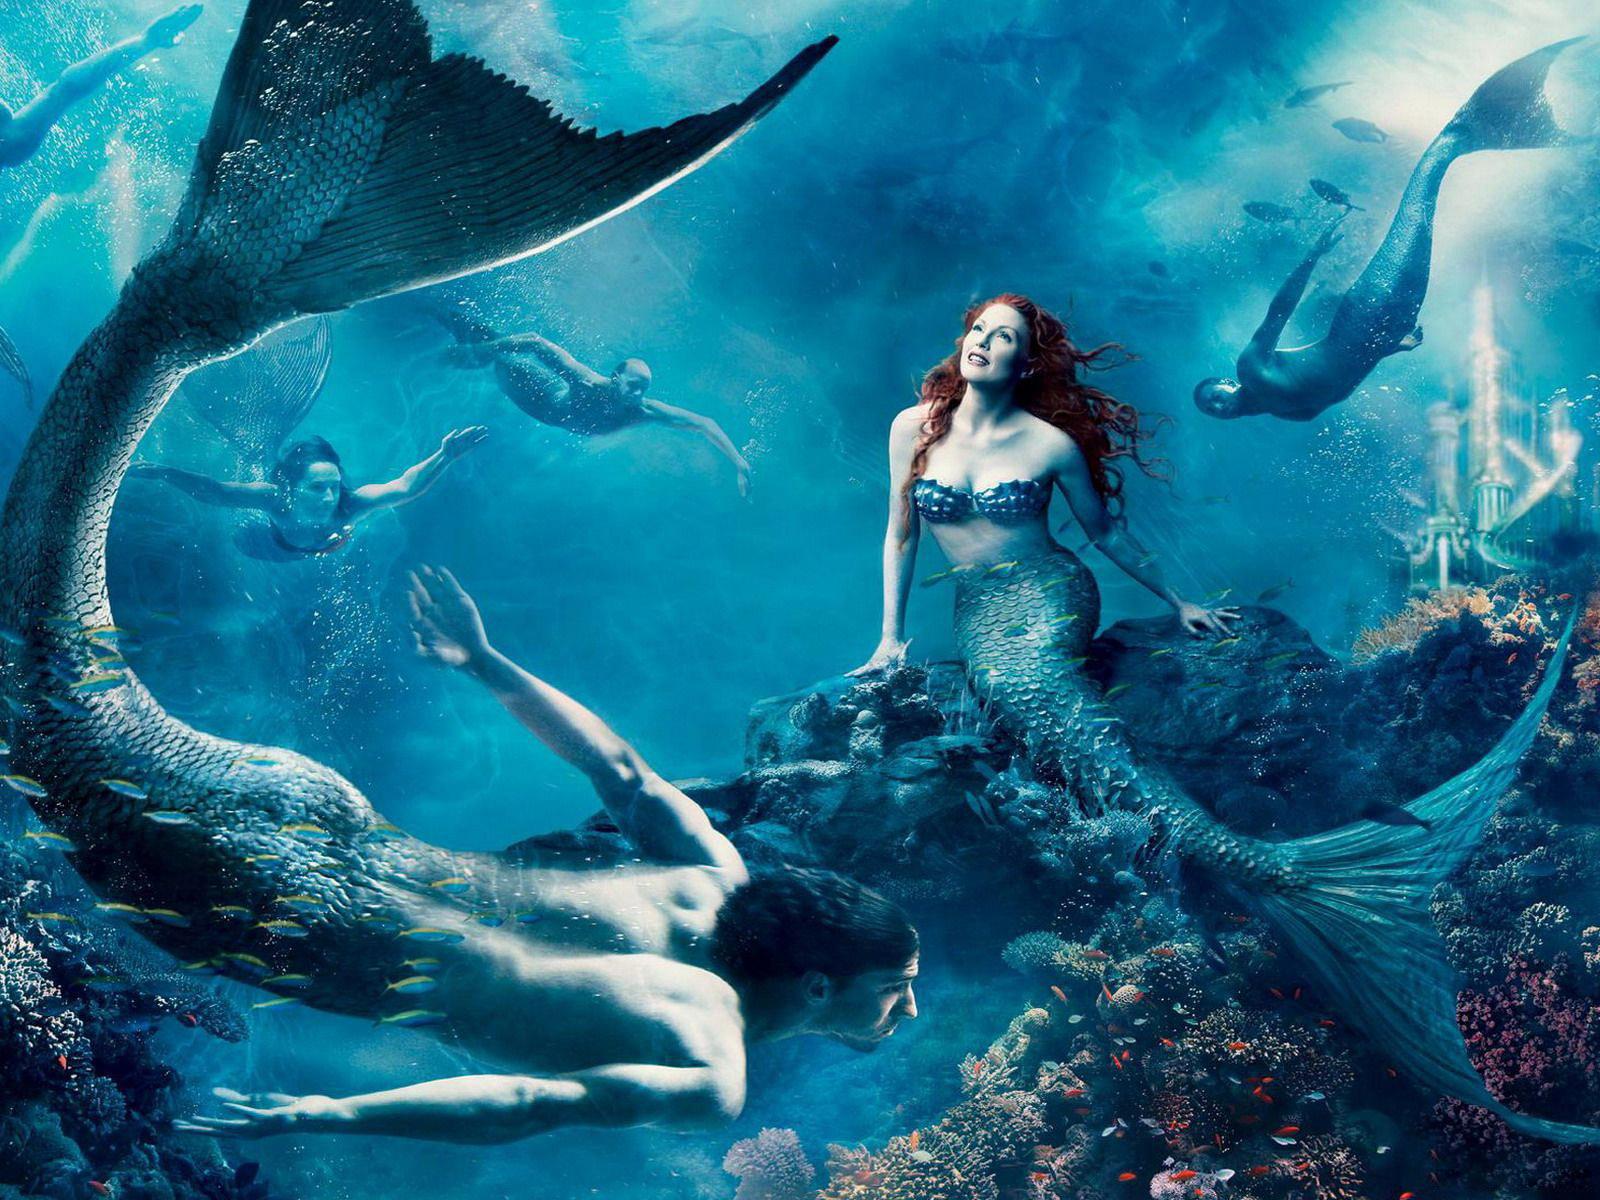 page size 1600x1200 desktop wallpaper of fantasy art mermaid 1600x1200